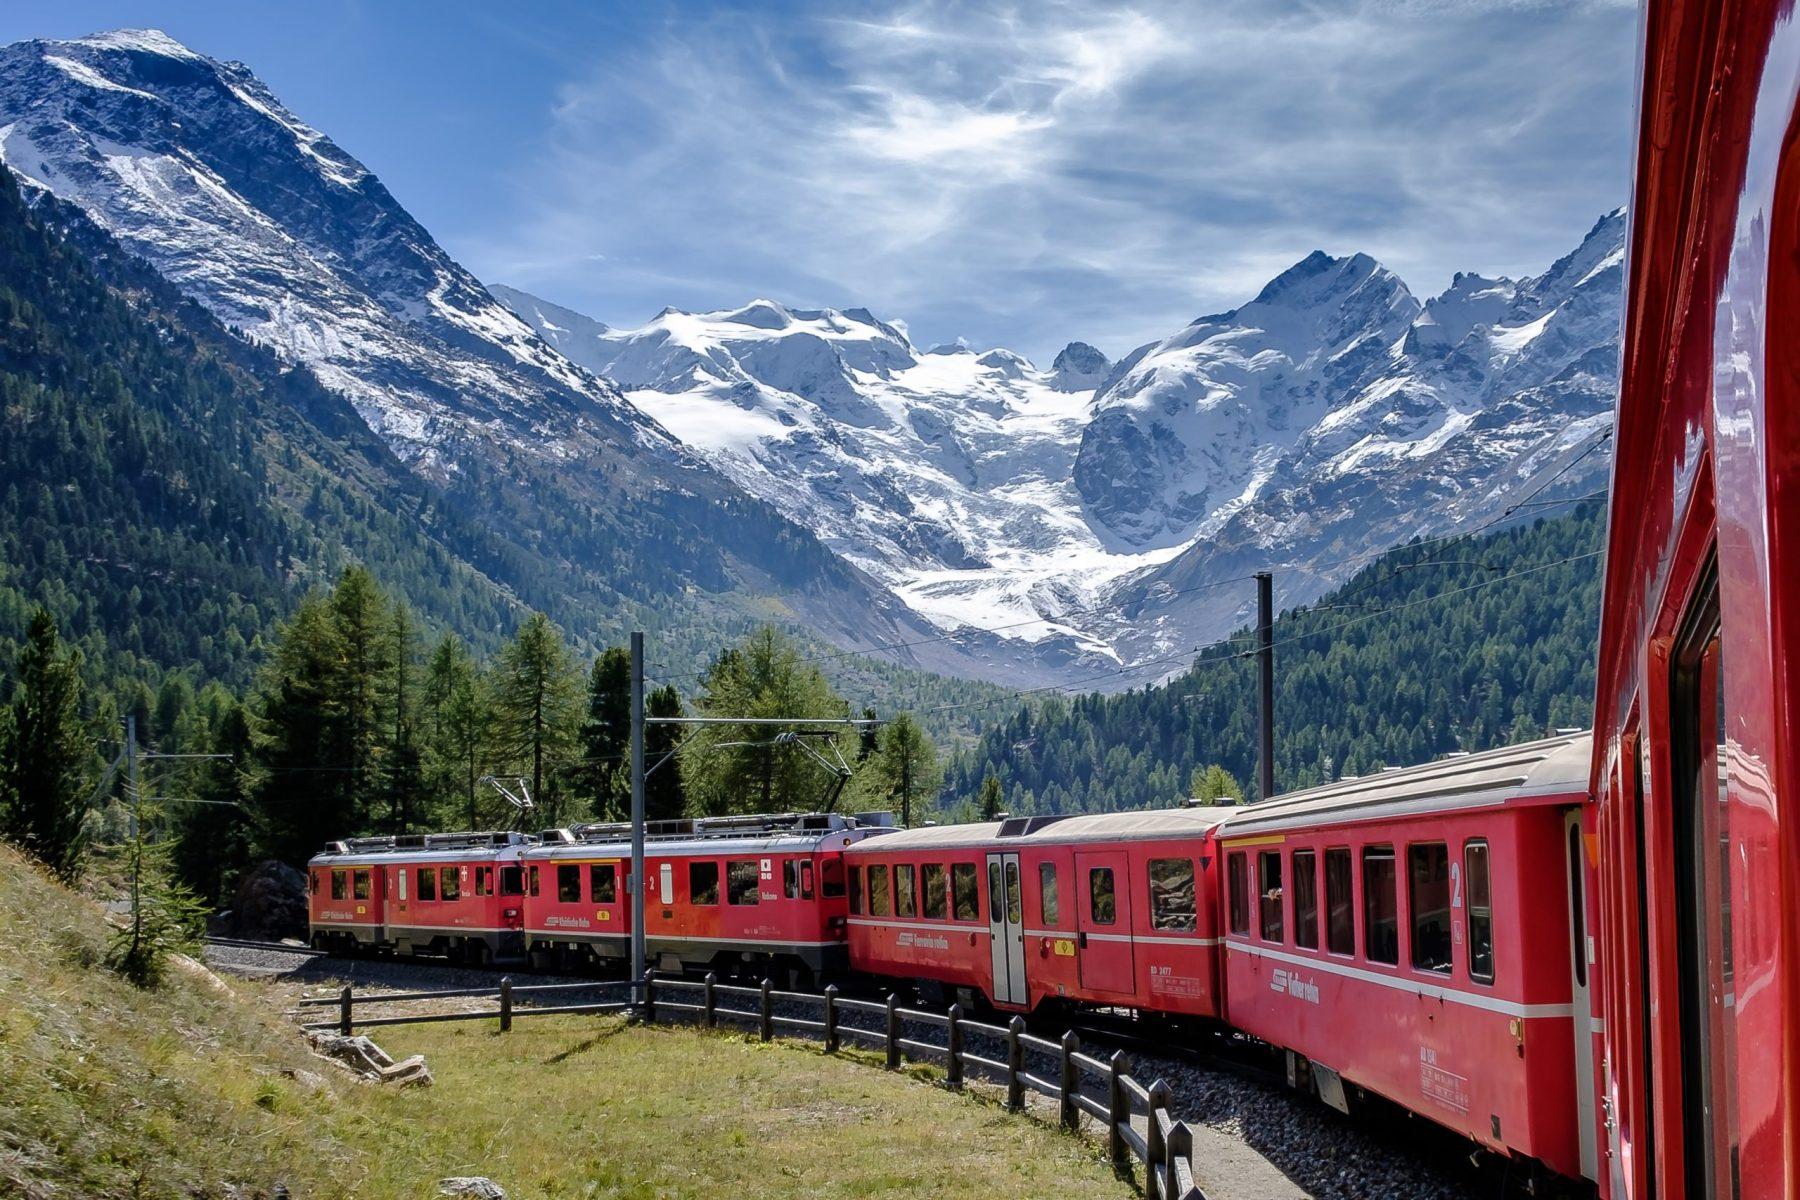 Scenic-train-rides-Switzerland-Bernina